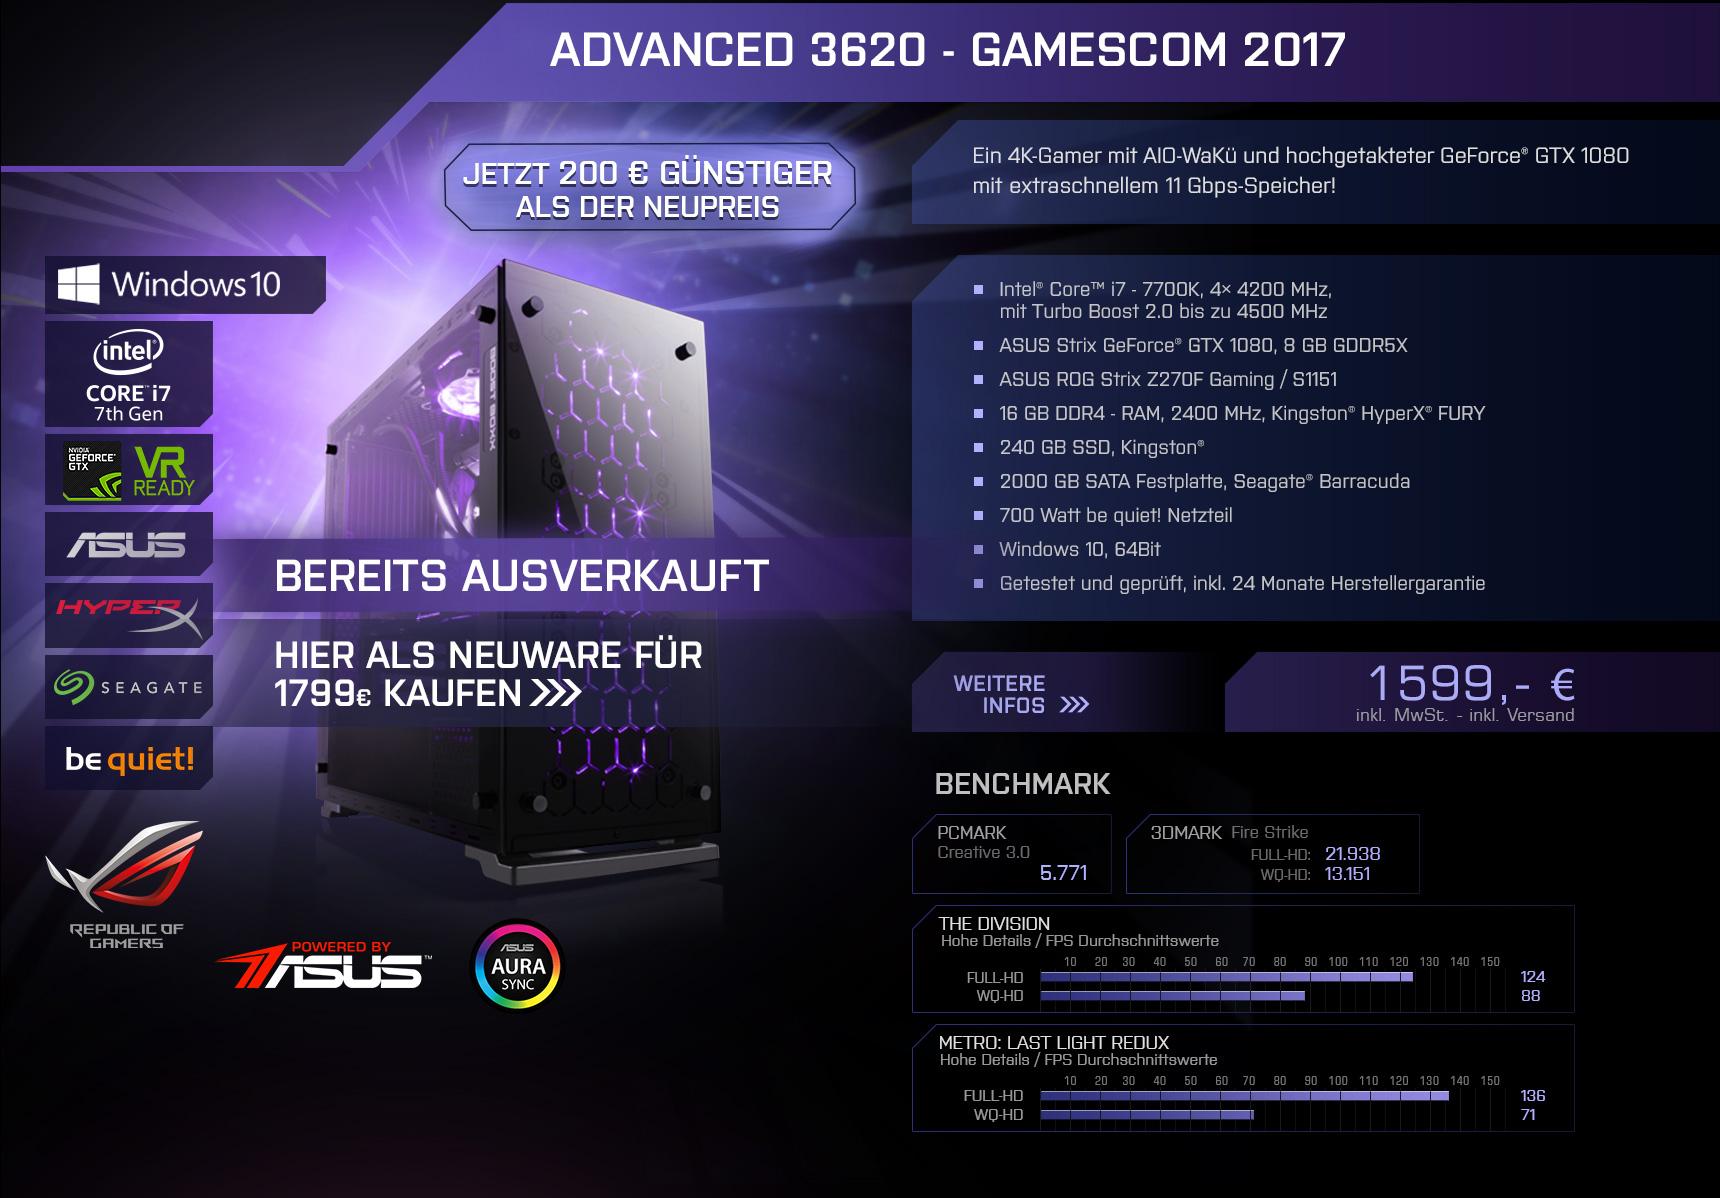 BoostBoxx Advanced 3620